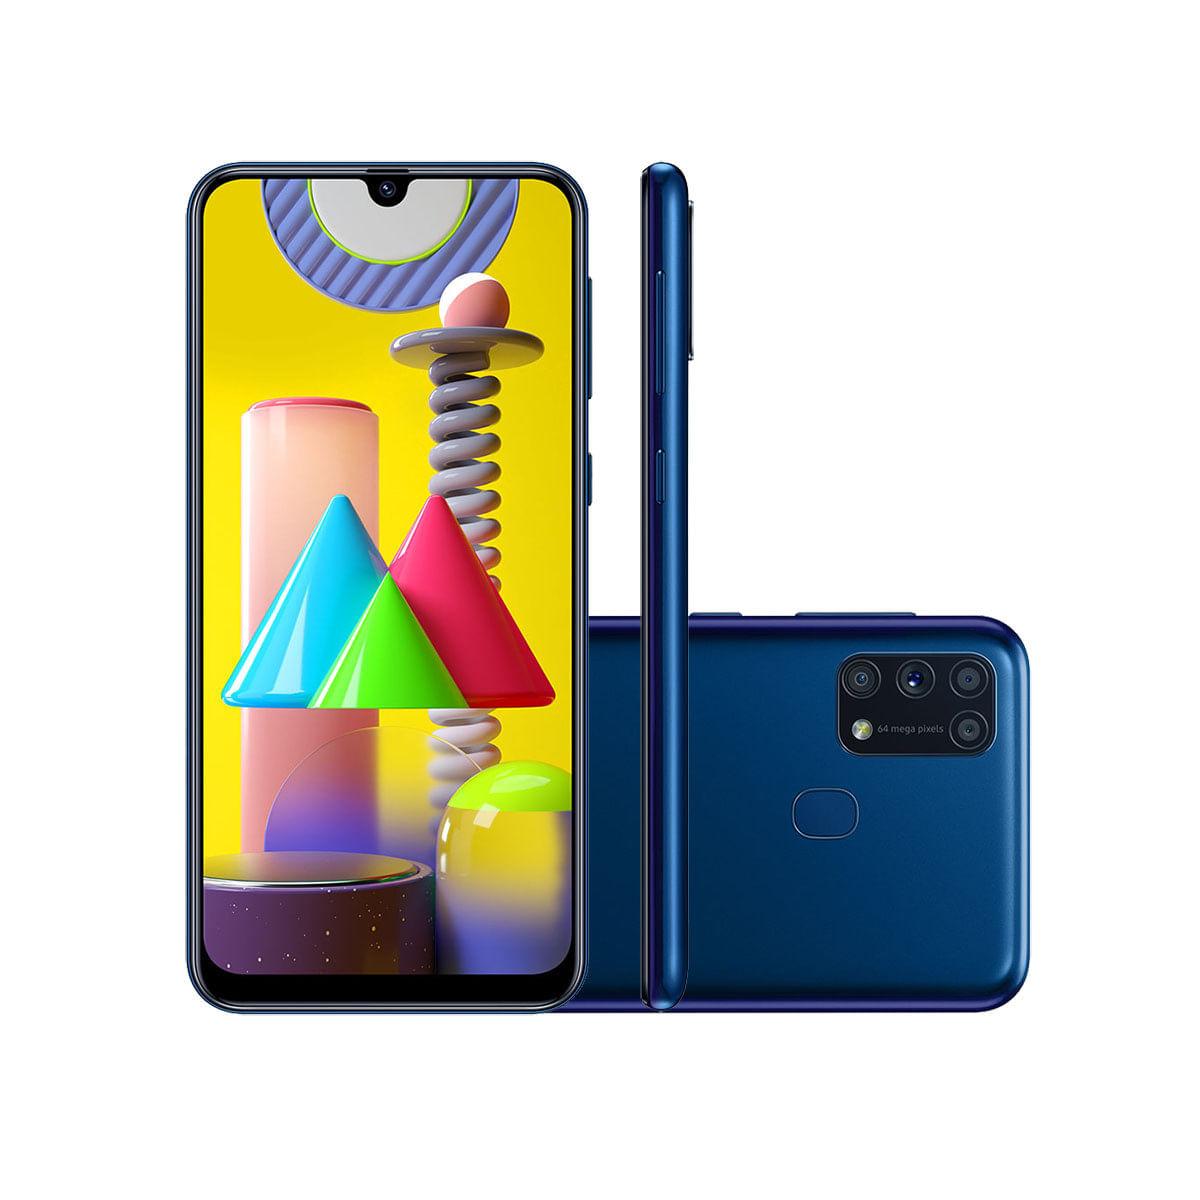 Celular Smartphone Samsung Galaxy M31 Sm-m315f 128gb Azul - Dual Chip